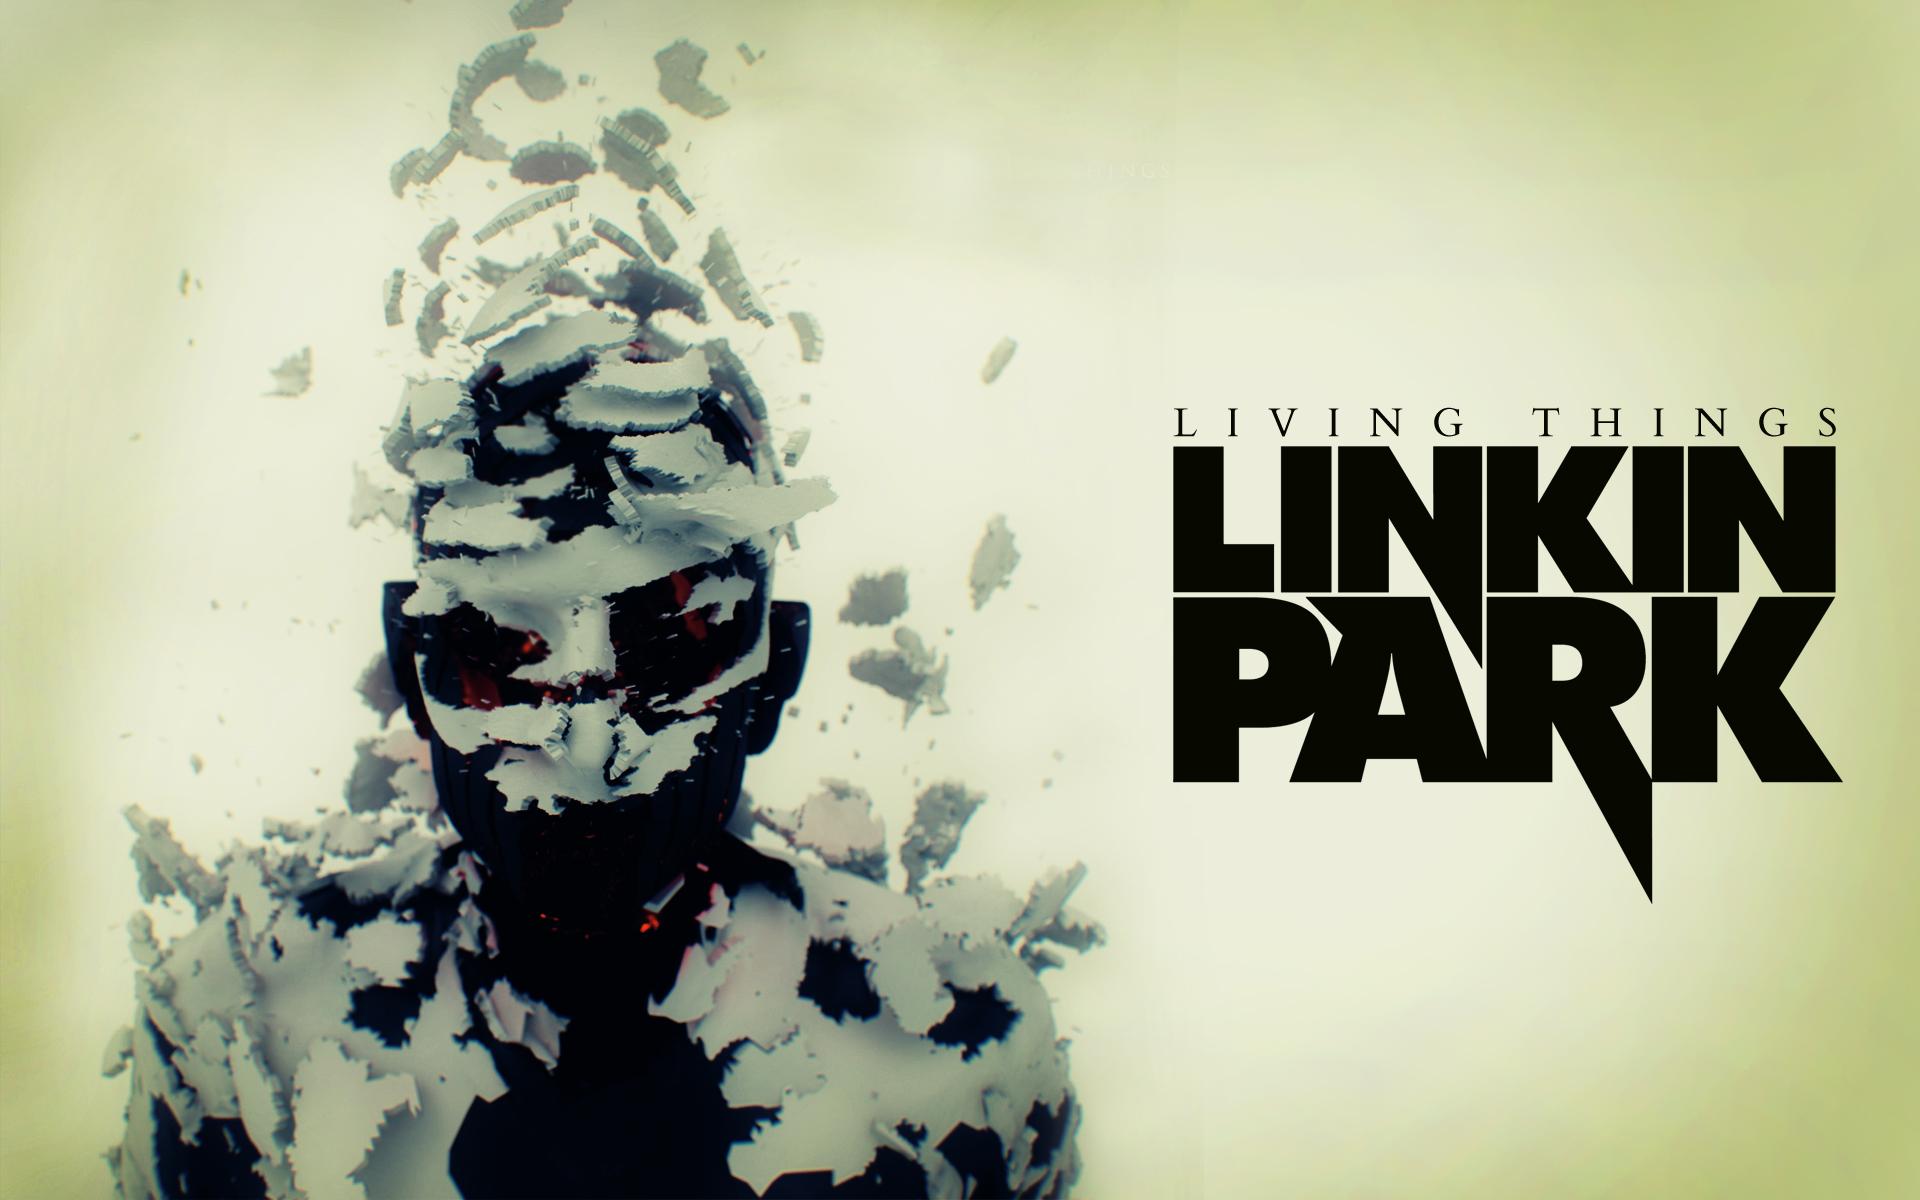 Linkin Park Wallpaper - Living Things Linkin Park , HD Wallpaper & Backgrounds